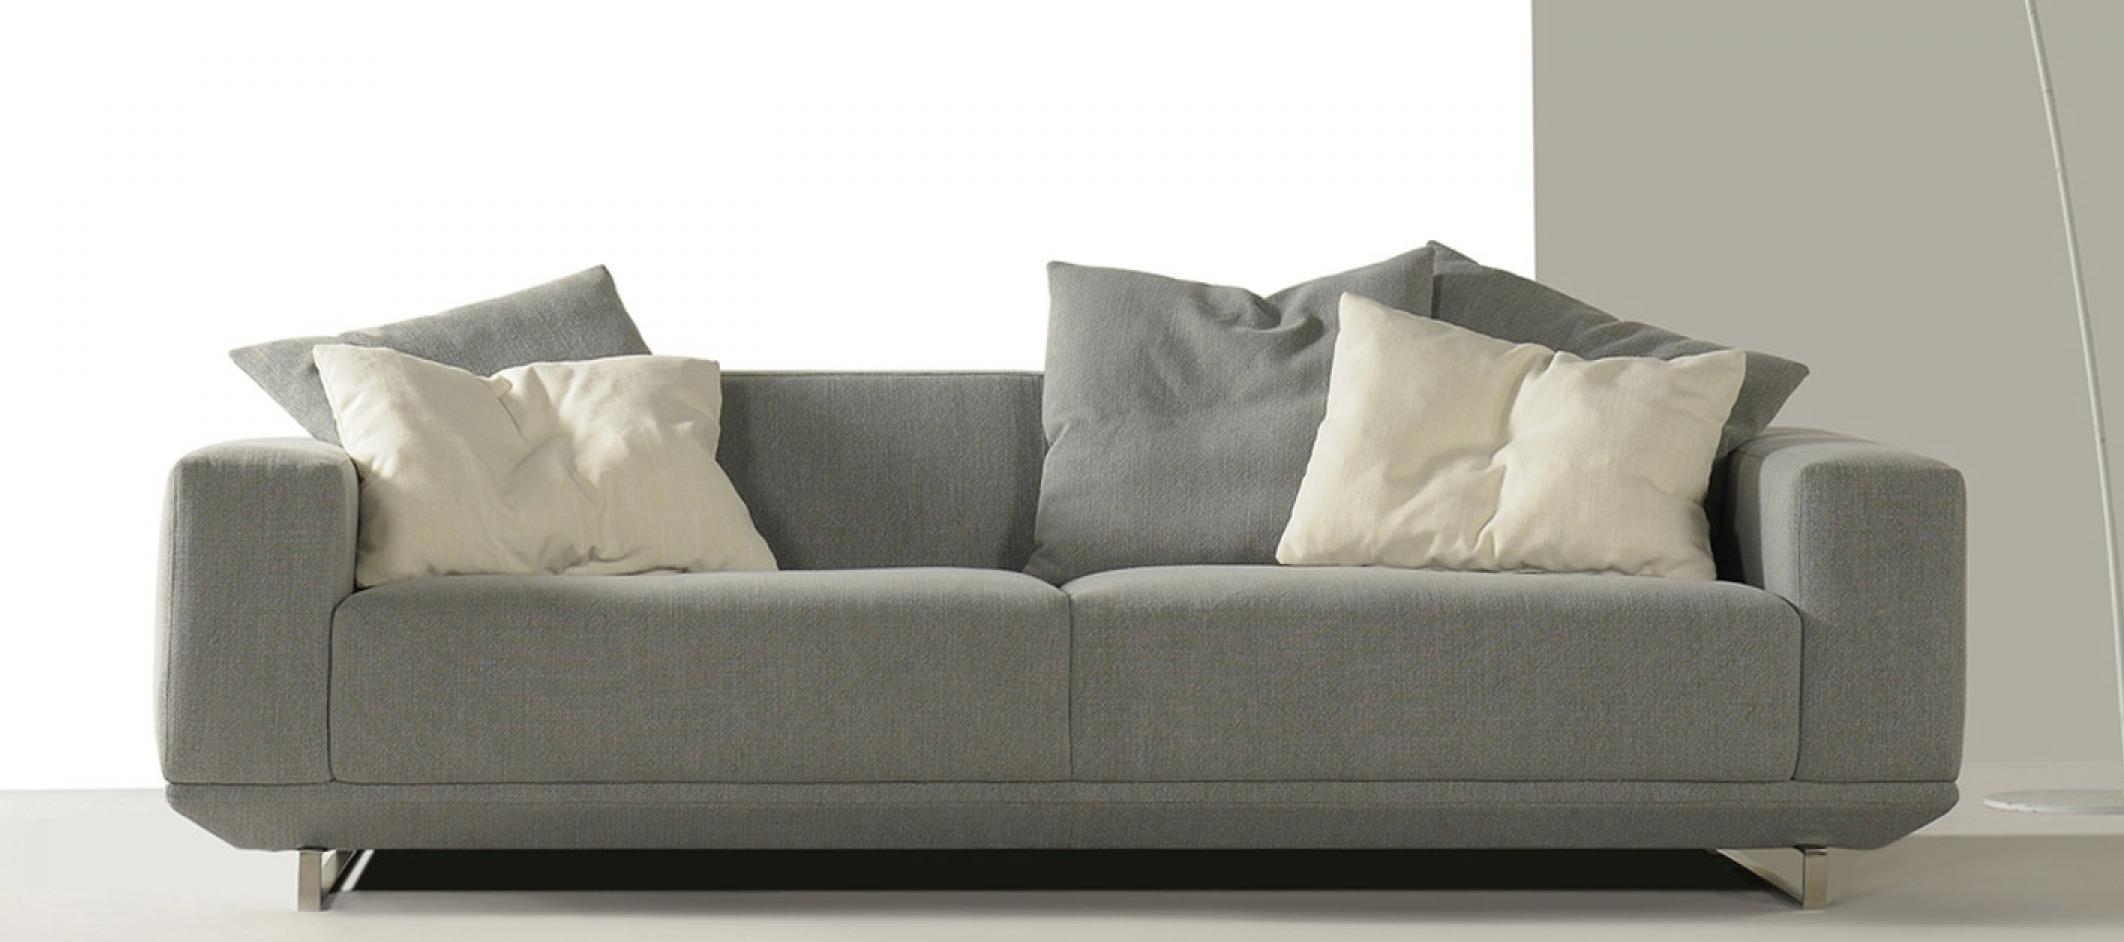 canape design solde bs05 montrealeast. Black Bedroom Furniture Sets. Home Design Ideas